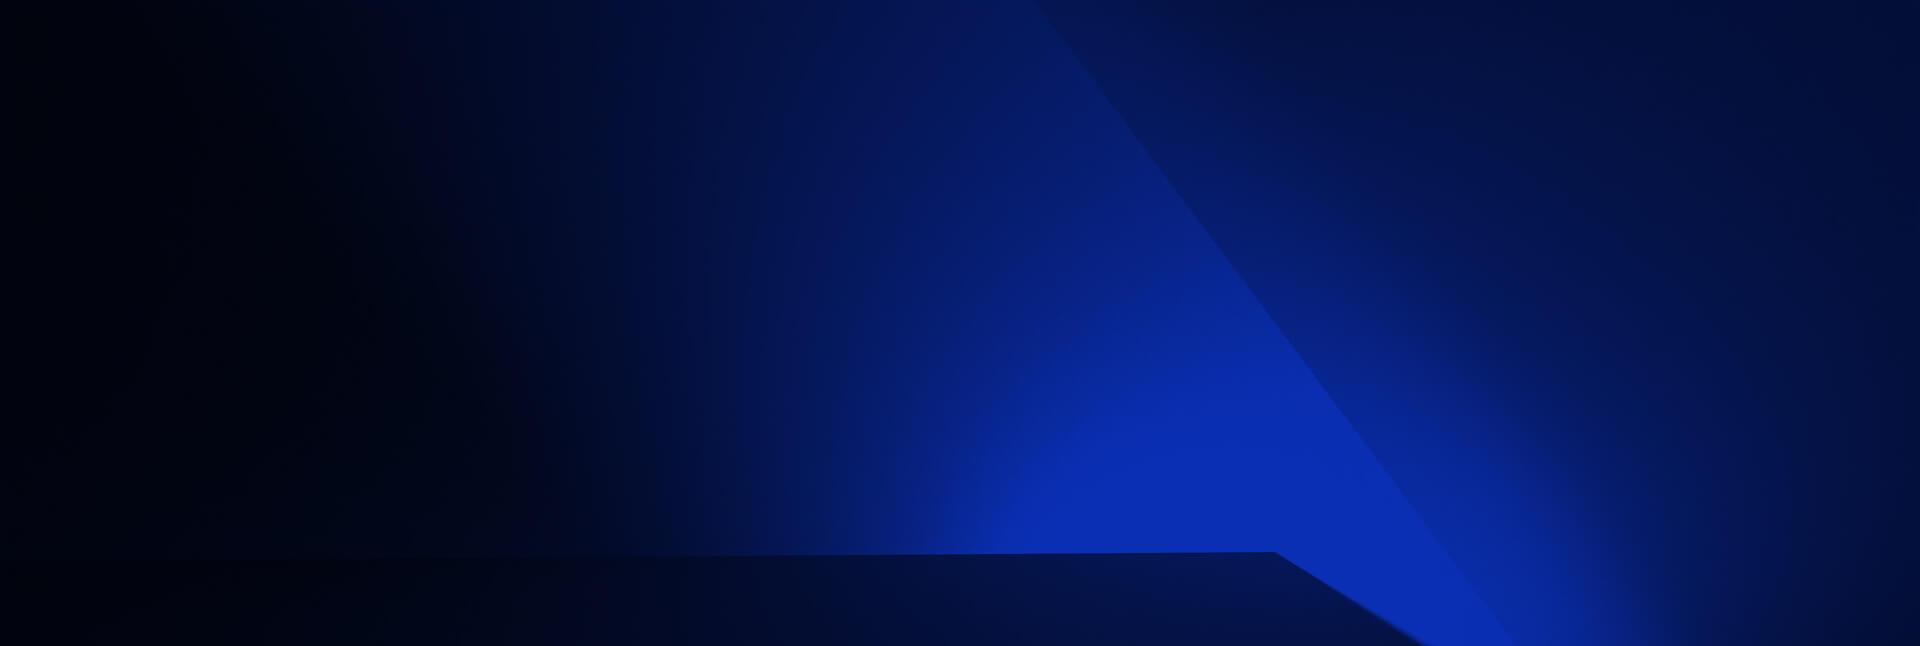 rra-background-blue-7-2021.jpg